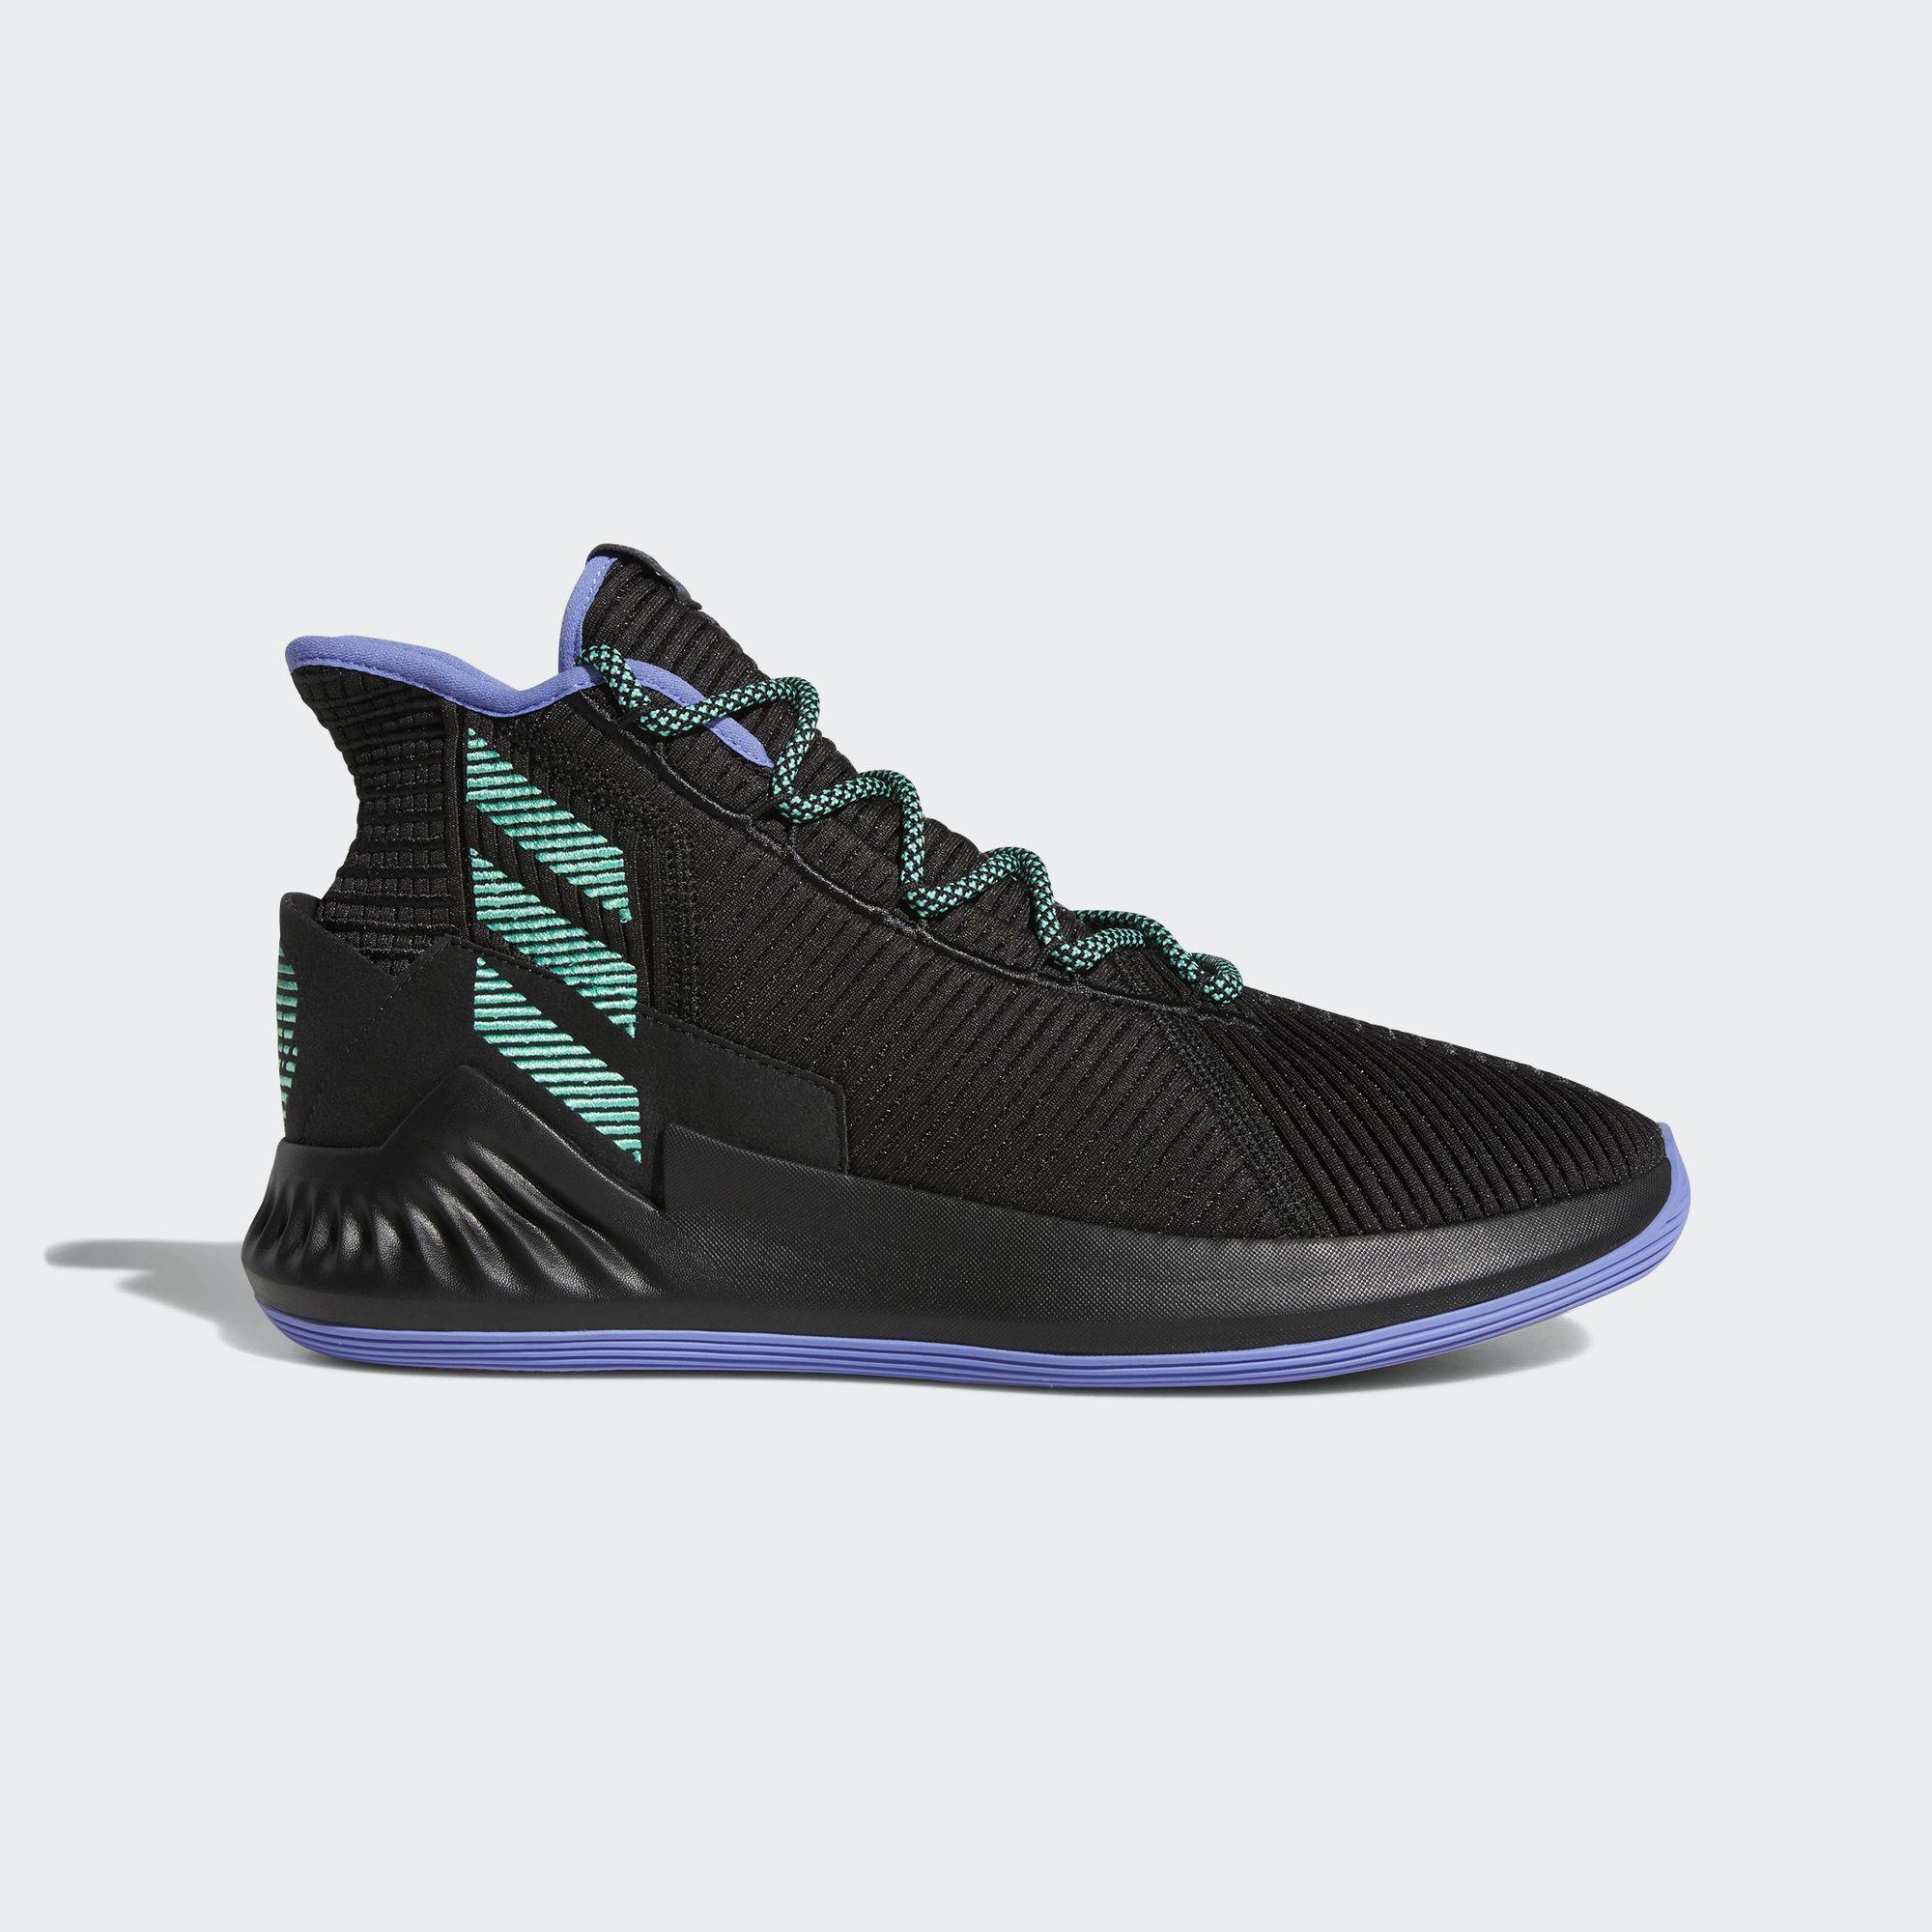 c0b8c66f5842 ... germany adidas d rose 9 black green. jul30 8758d 5b9cb